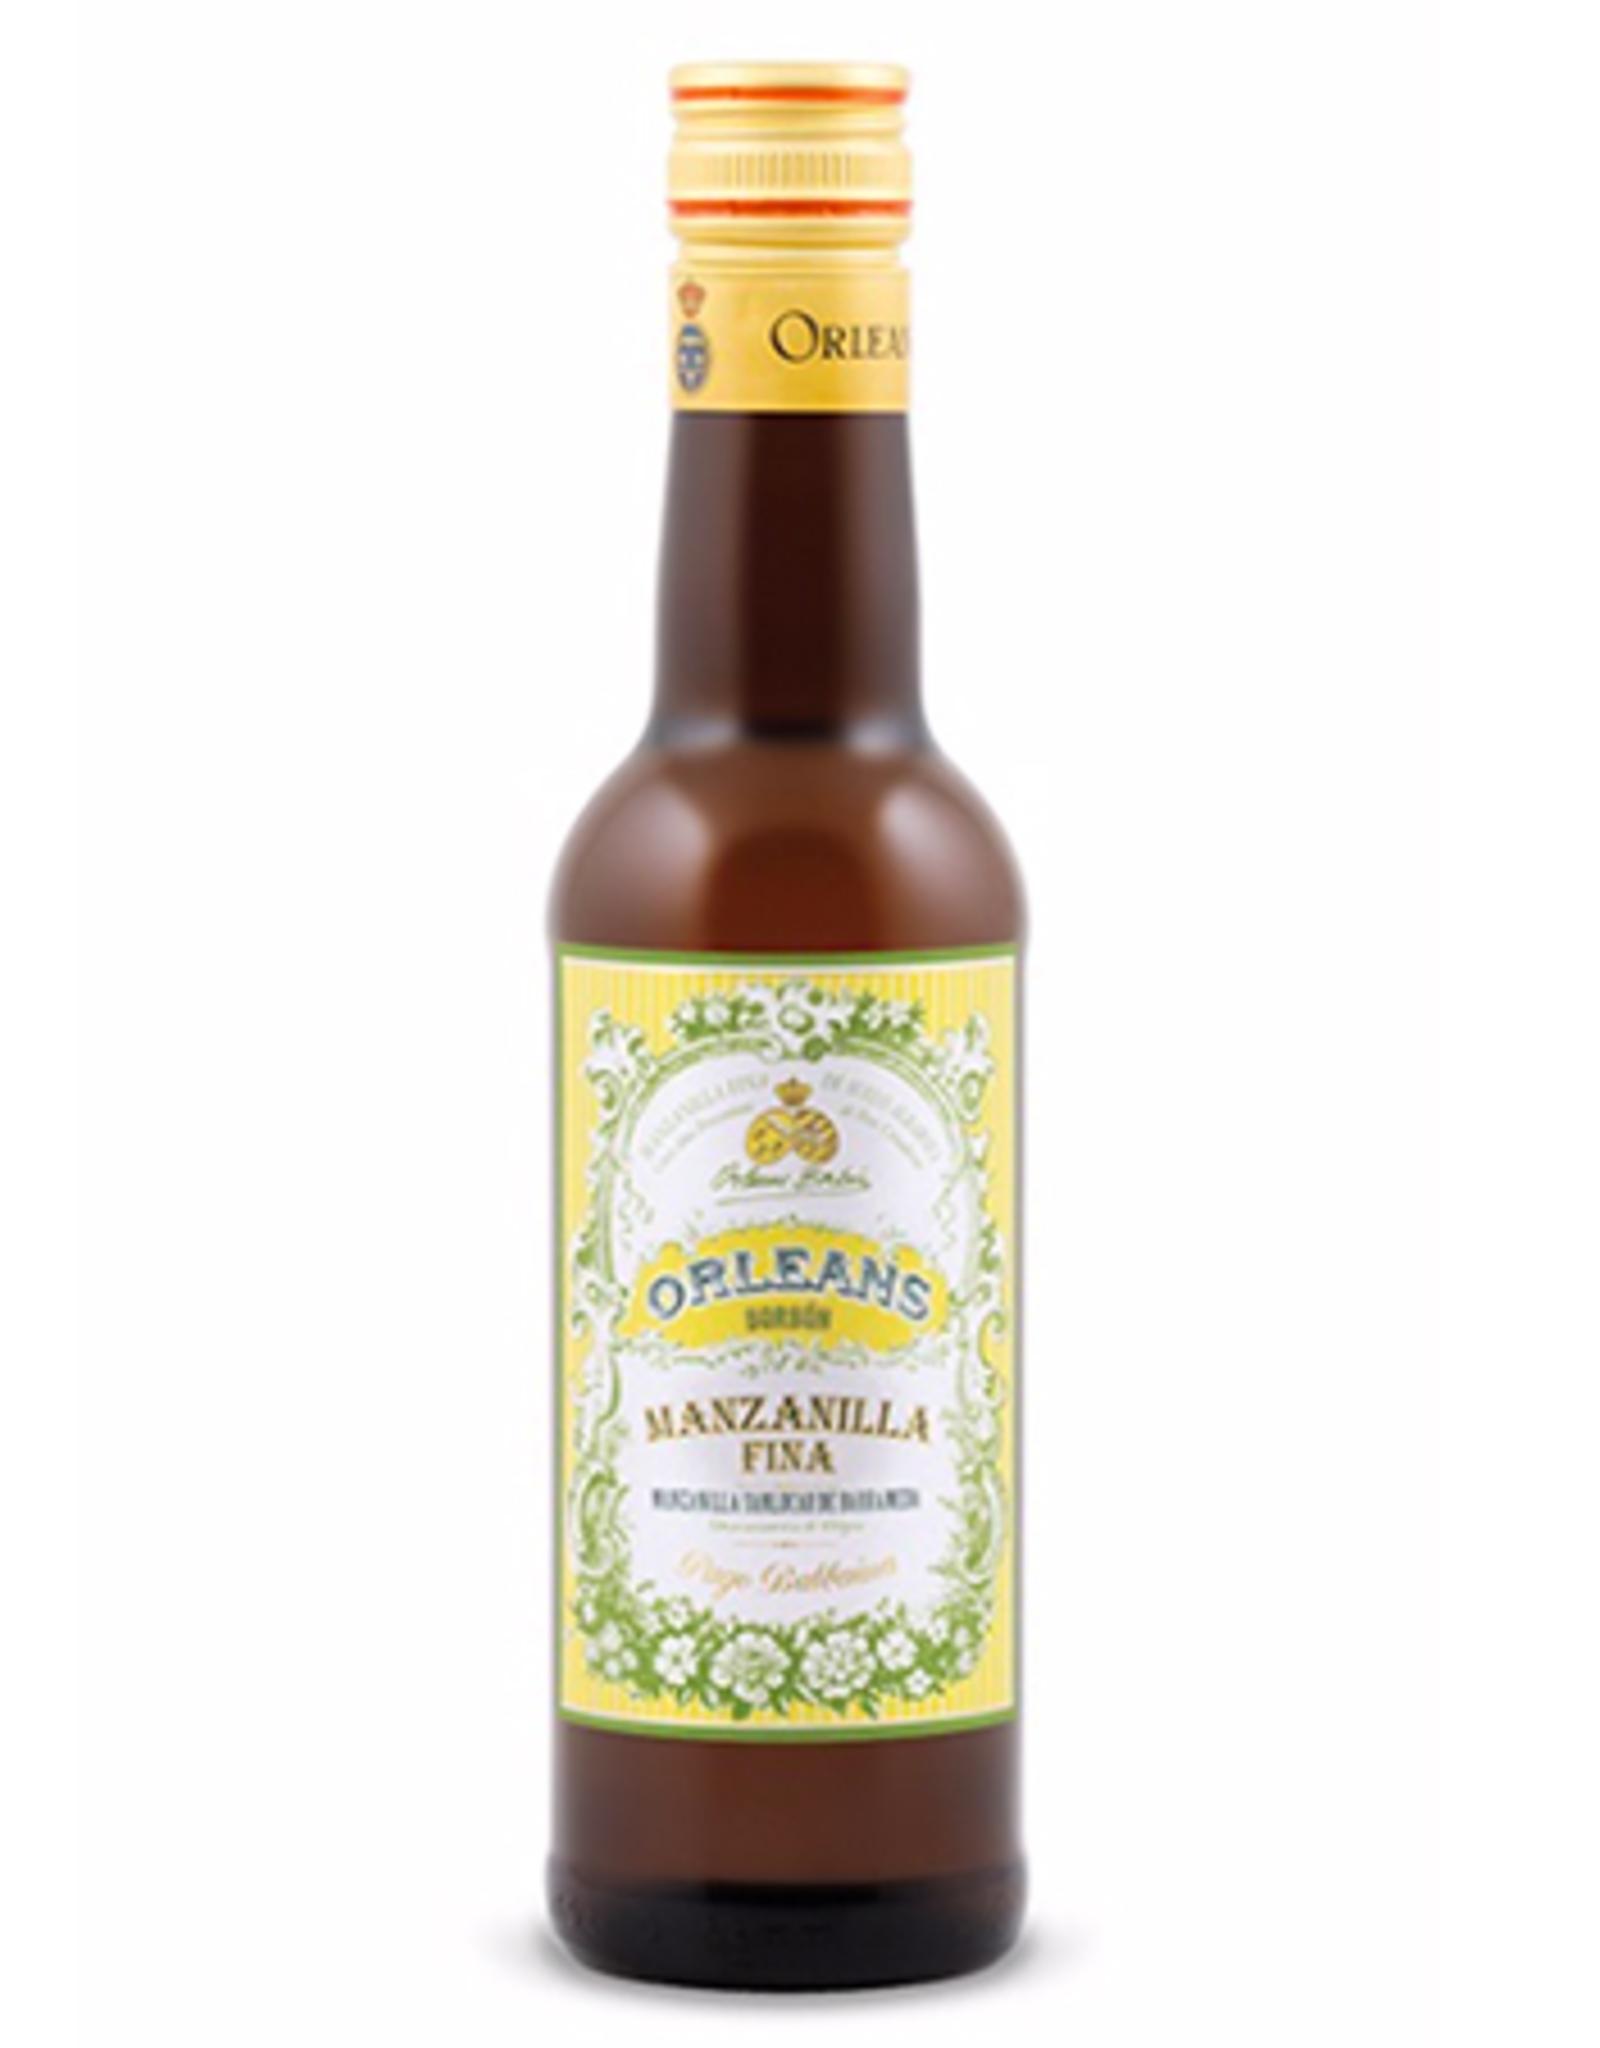 Orleans Bourbon Manzanilla Fina NV